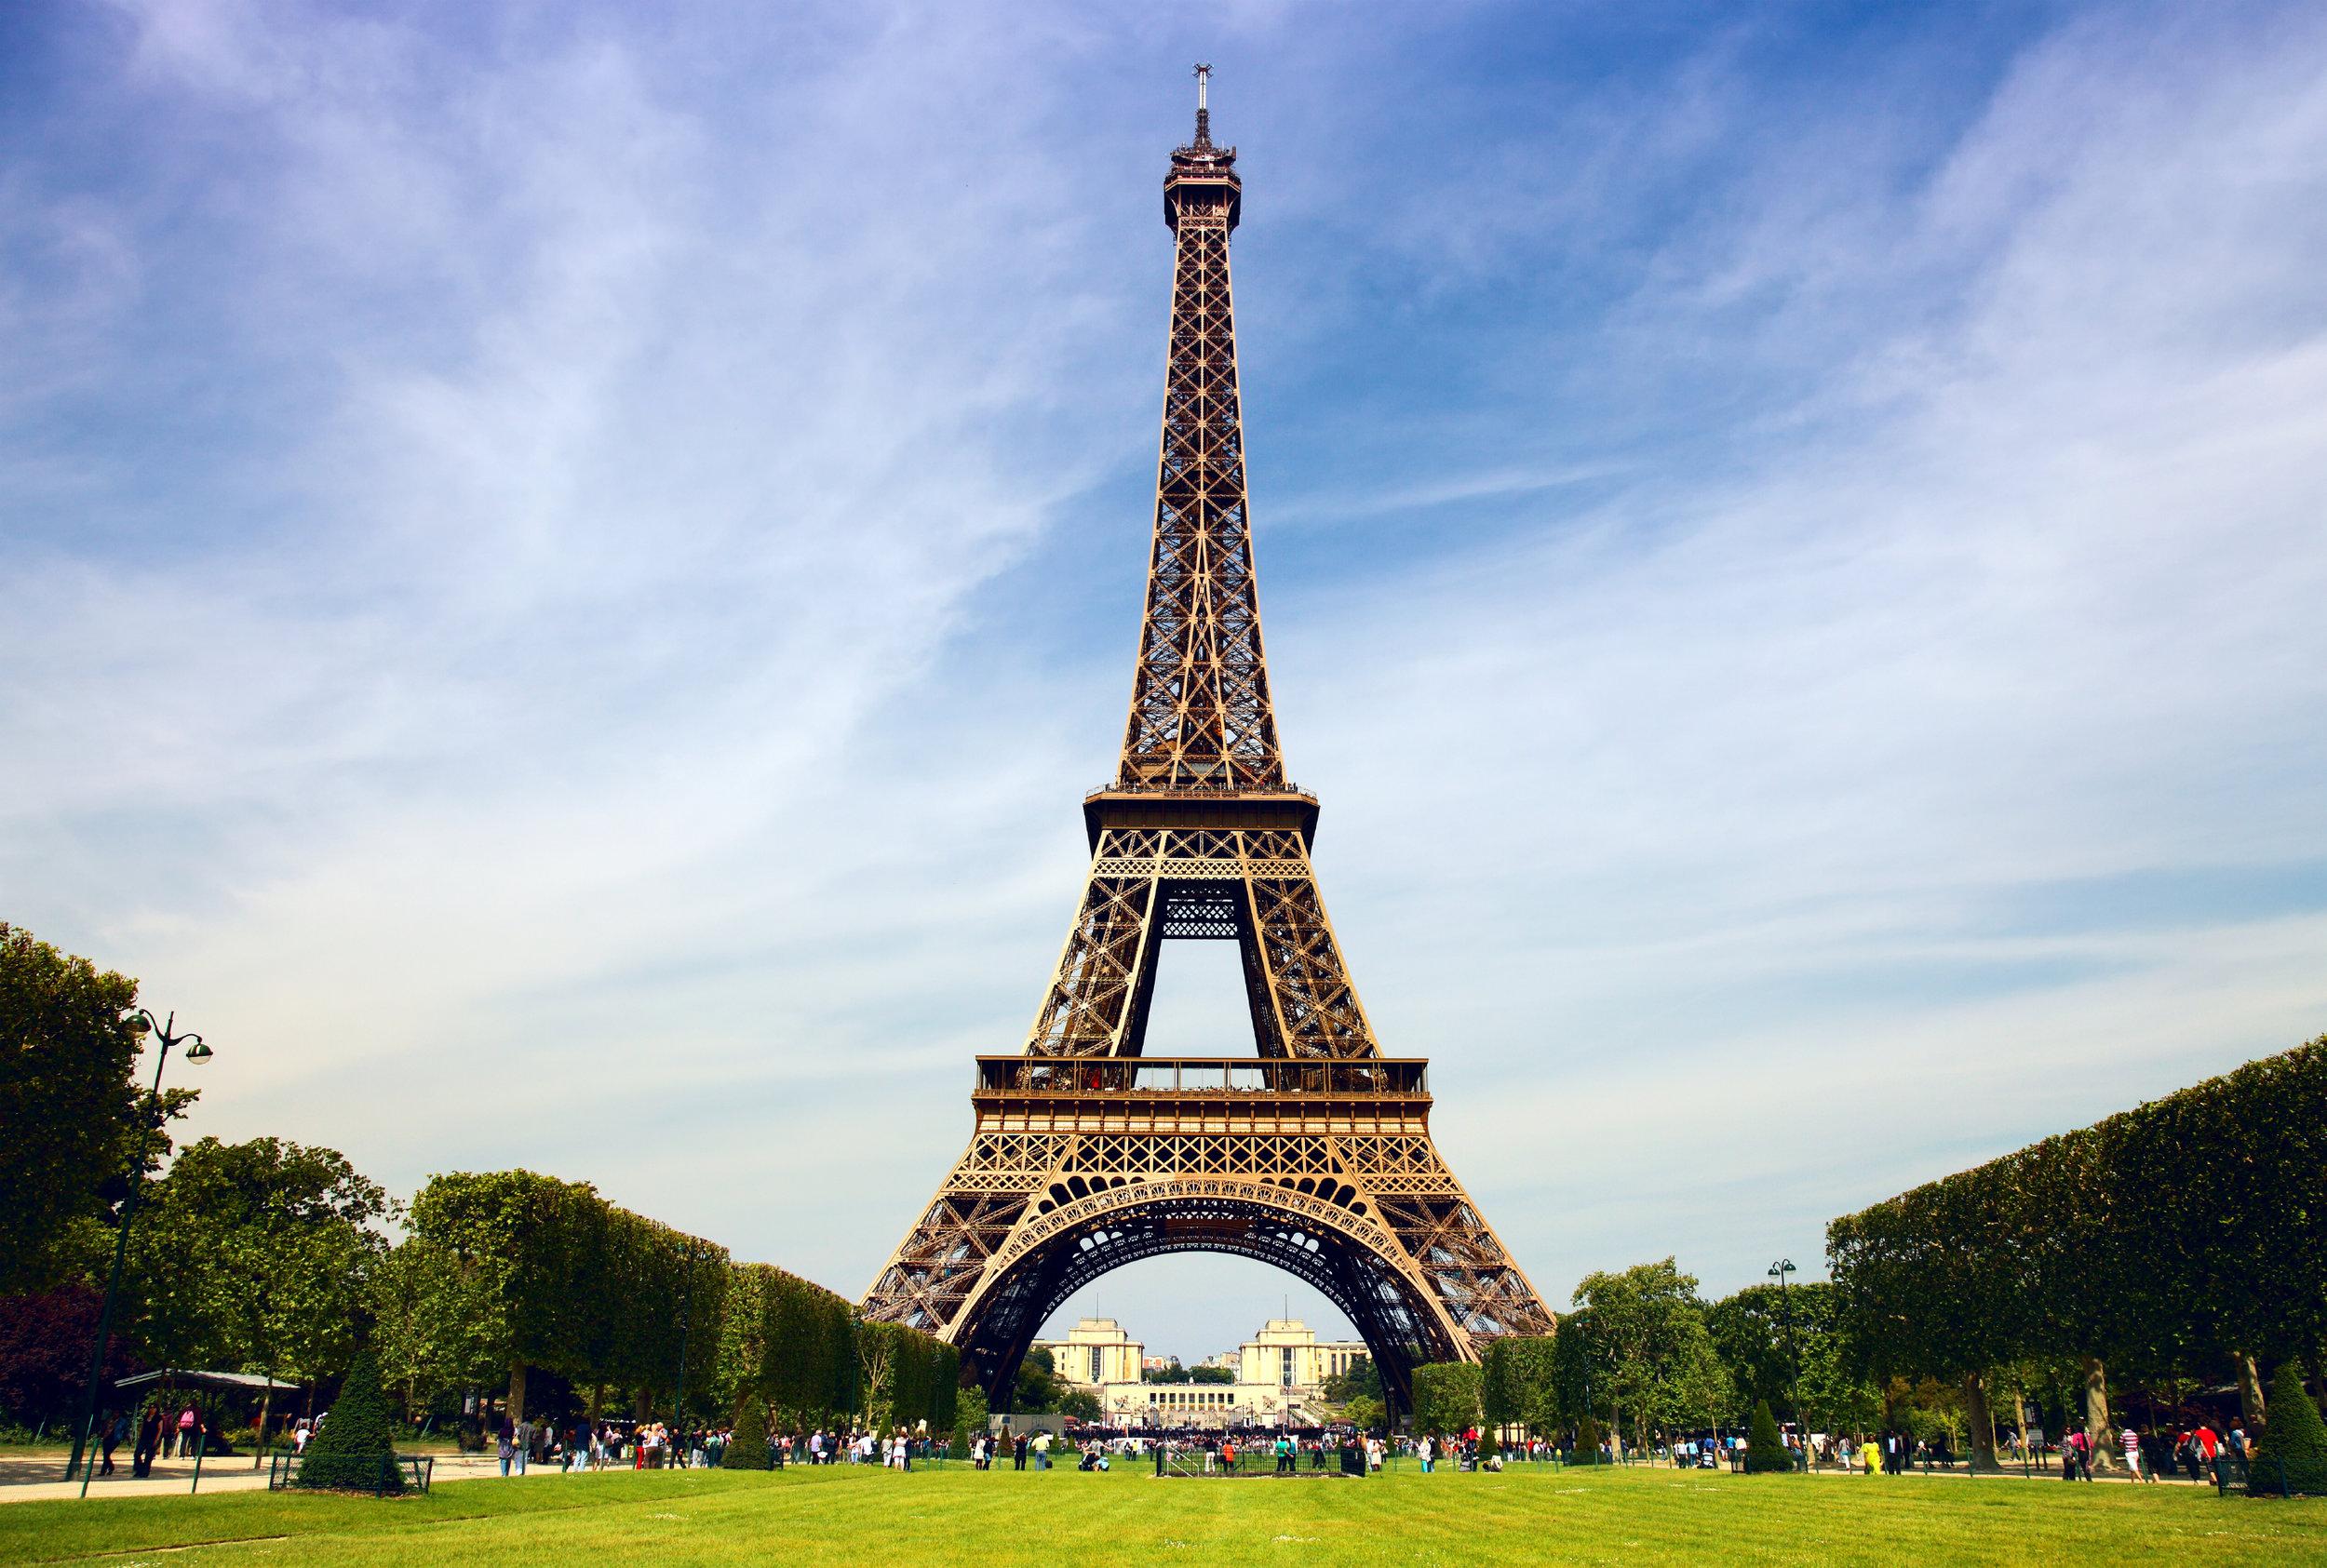 hith-eiffel-tower-iStock_000016468972Large.jpg